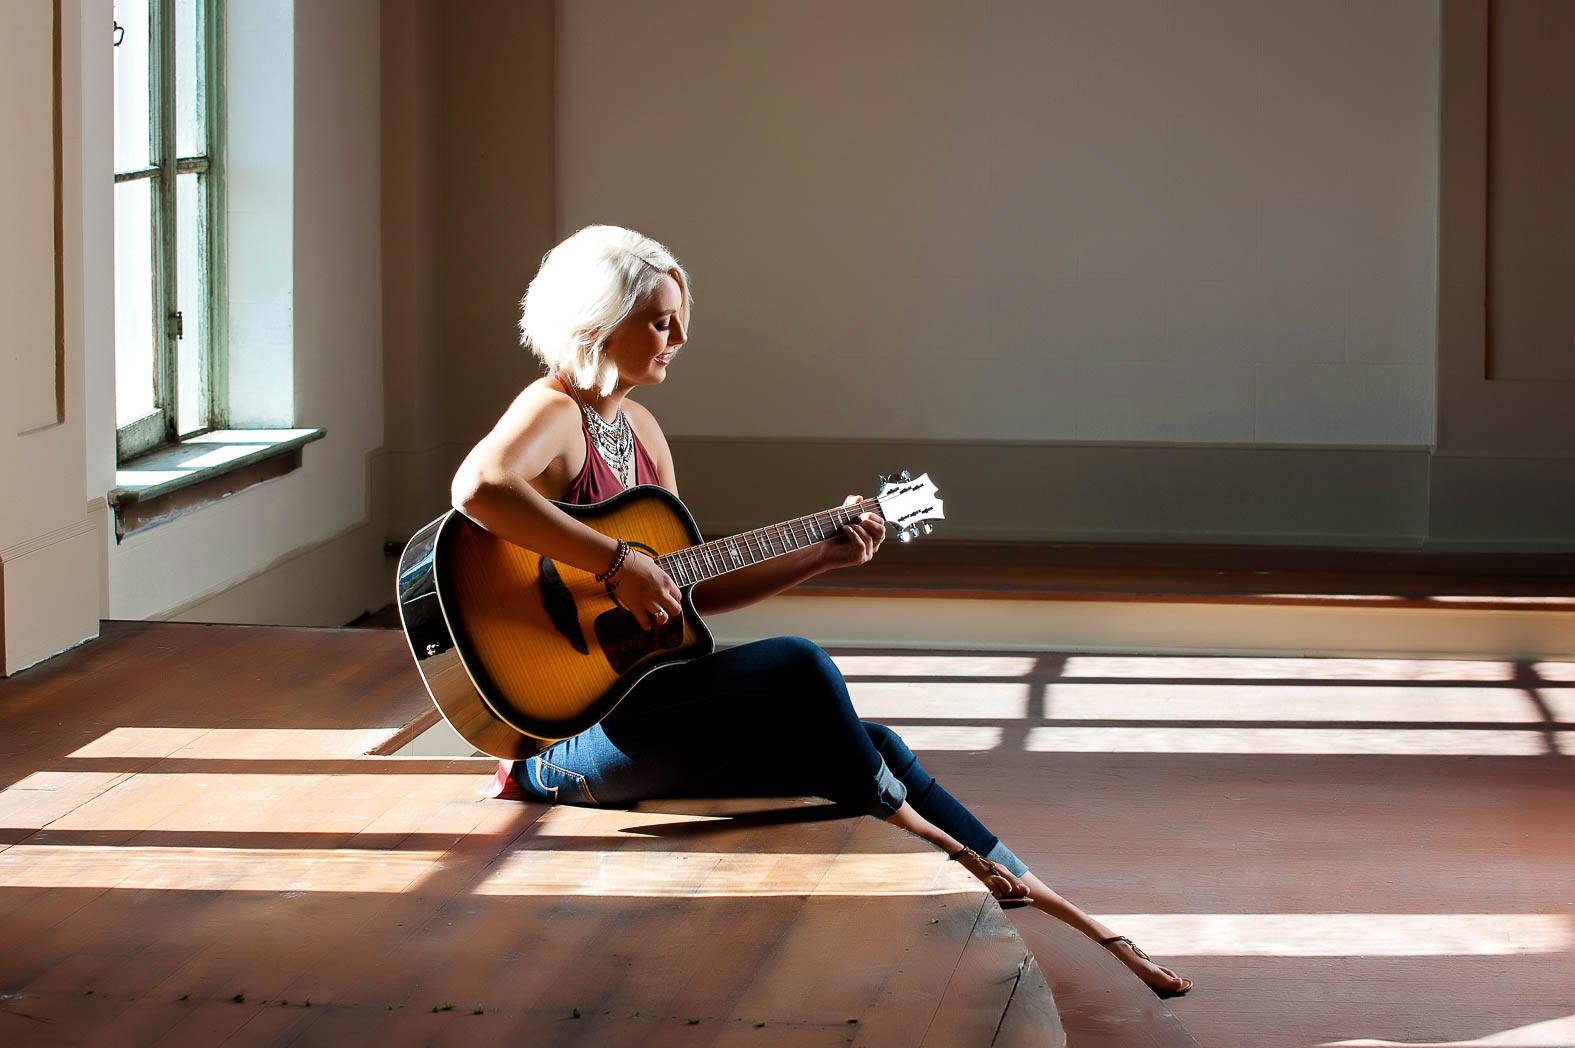 karina-musical-senior-pictures-guitar-soft-lighting-photonuvo